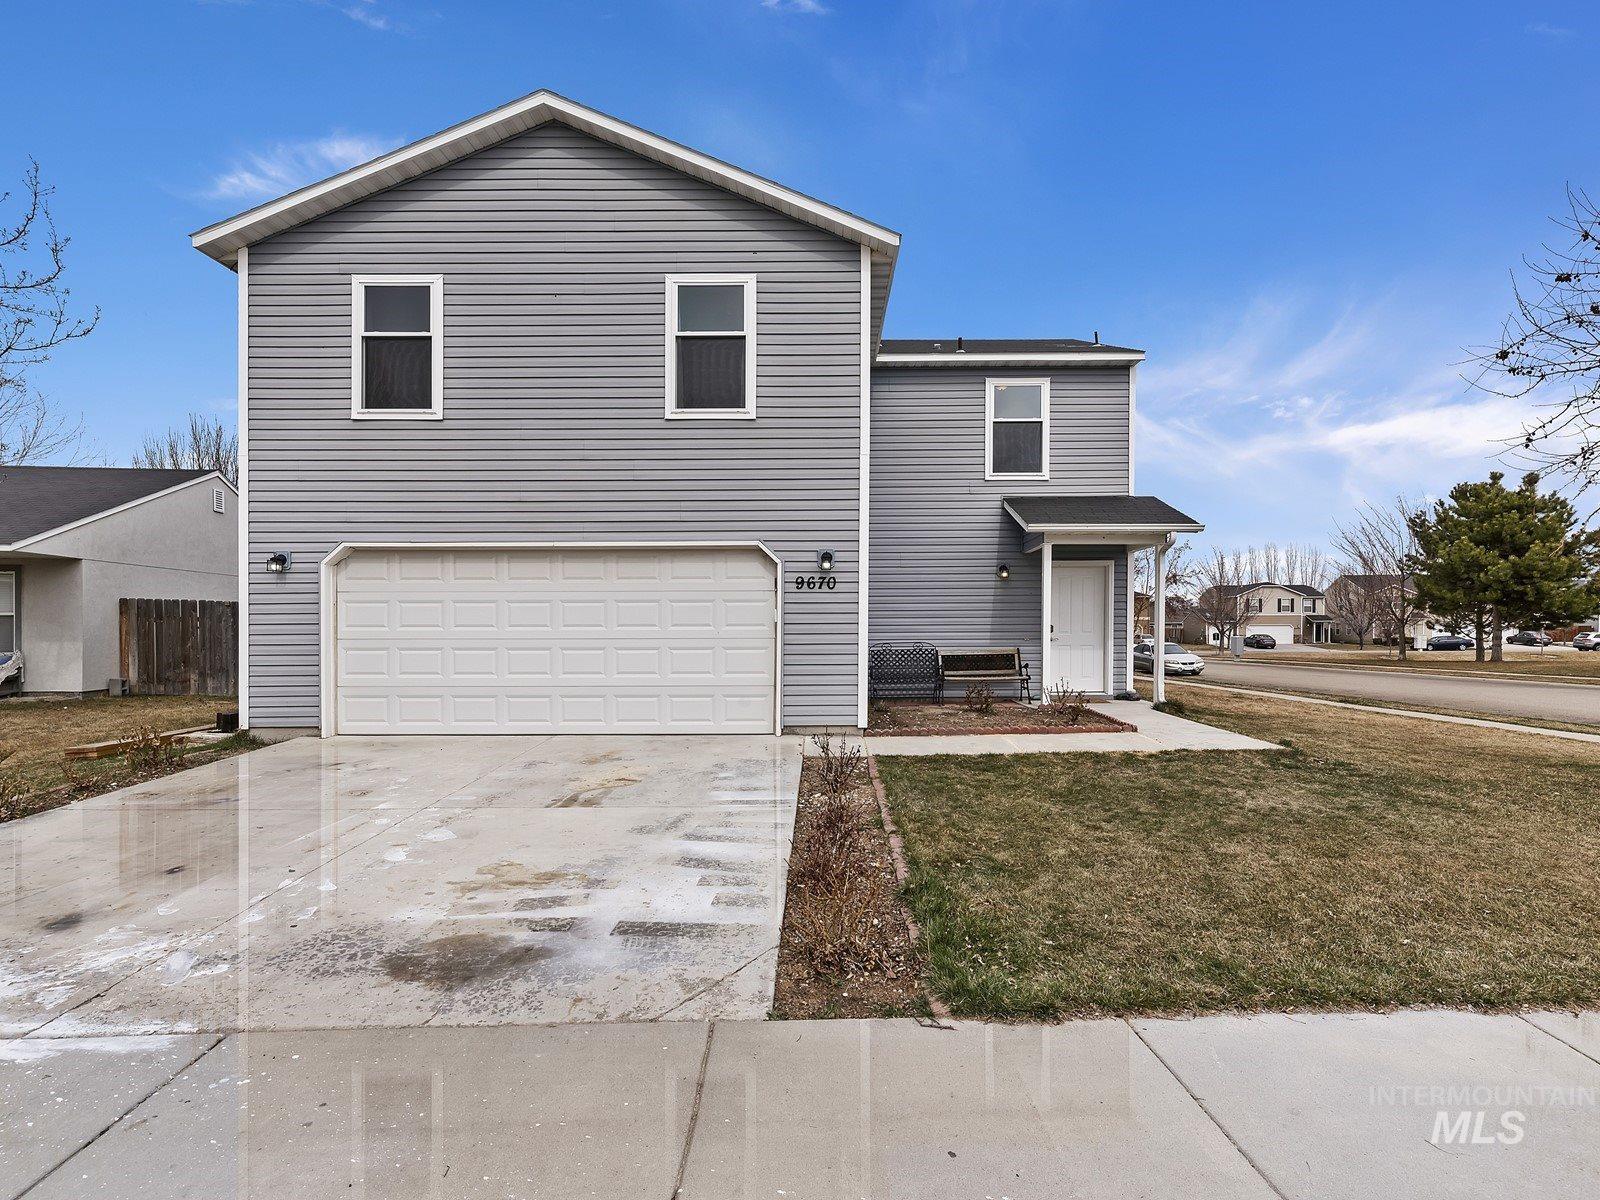 9670 W Trestlewood Property Photo - Boise, ID real estate listing